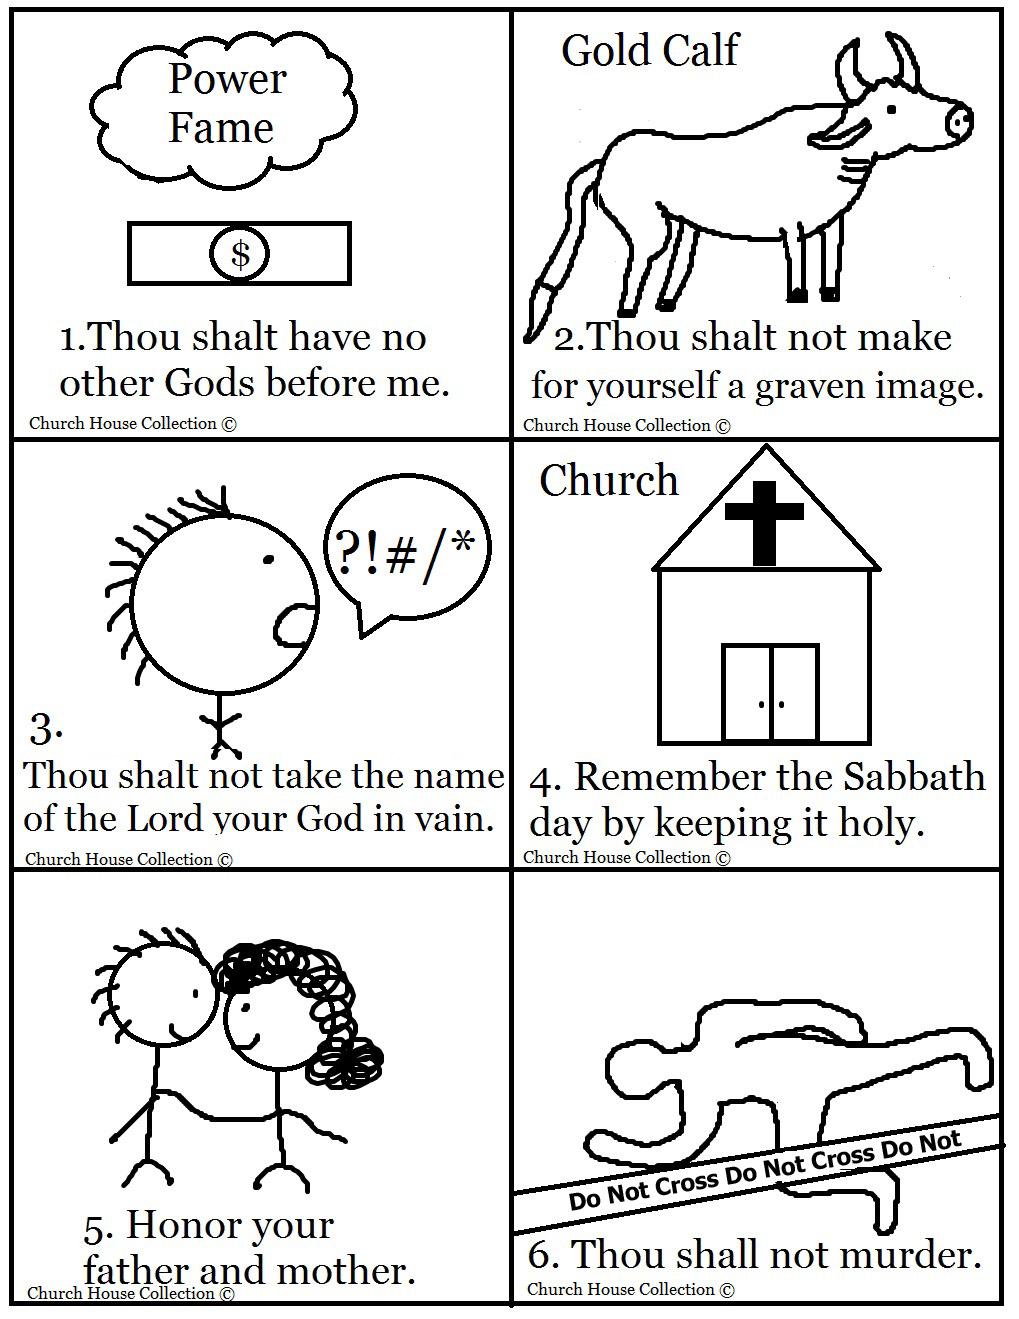 10 Commandments Worksheet  Worksheet & Workbook Site math worksheets, worksheets, free worksheets, education, and grade worksheets Ten Commandments Worksheets For Kids 1319 x 1019